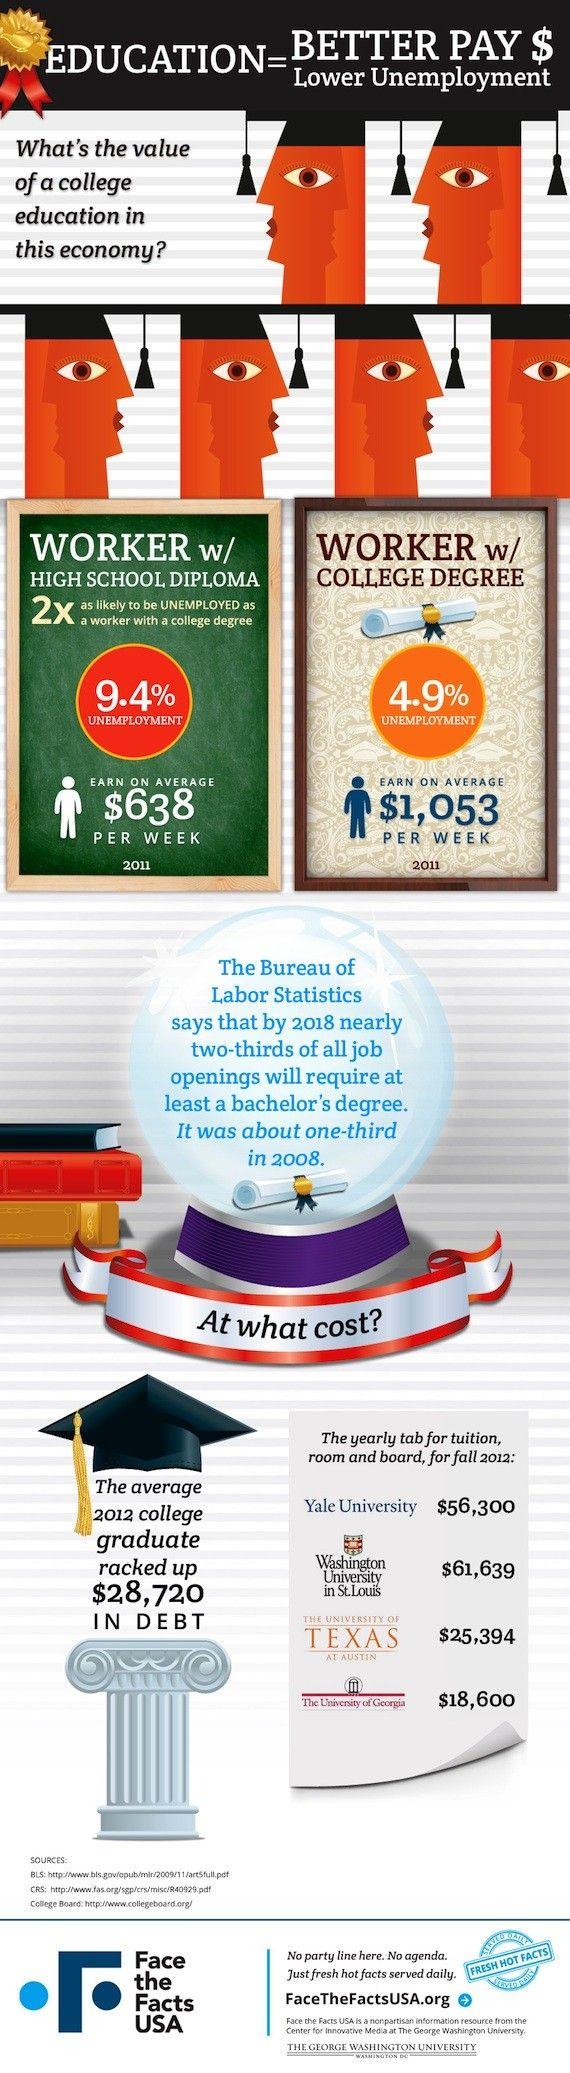 Harvard hgse computer tables flickr photo sharing - Best 25 Bachelor Of Education Ideas On Pinterest Teaching Career Teaching Tips And Teacher